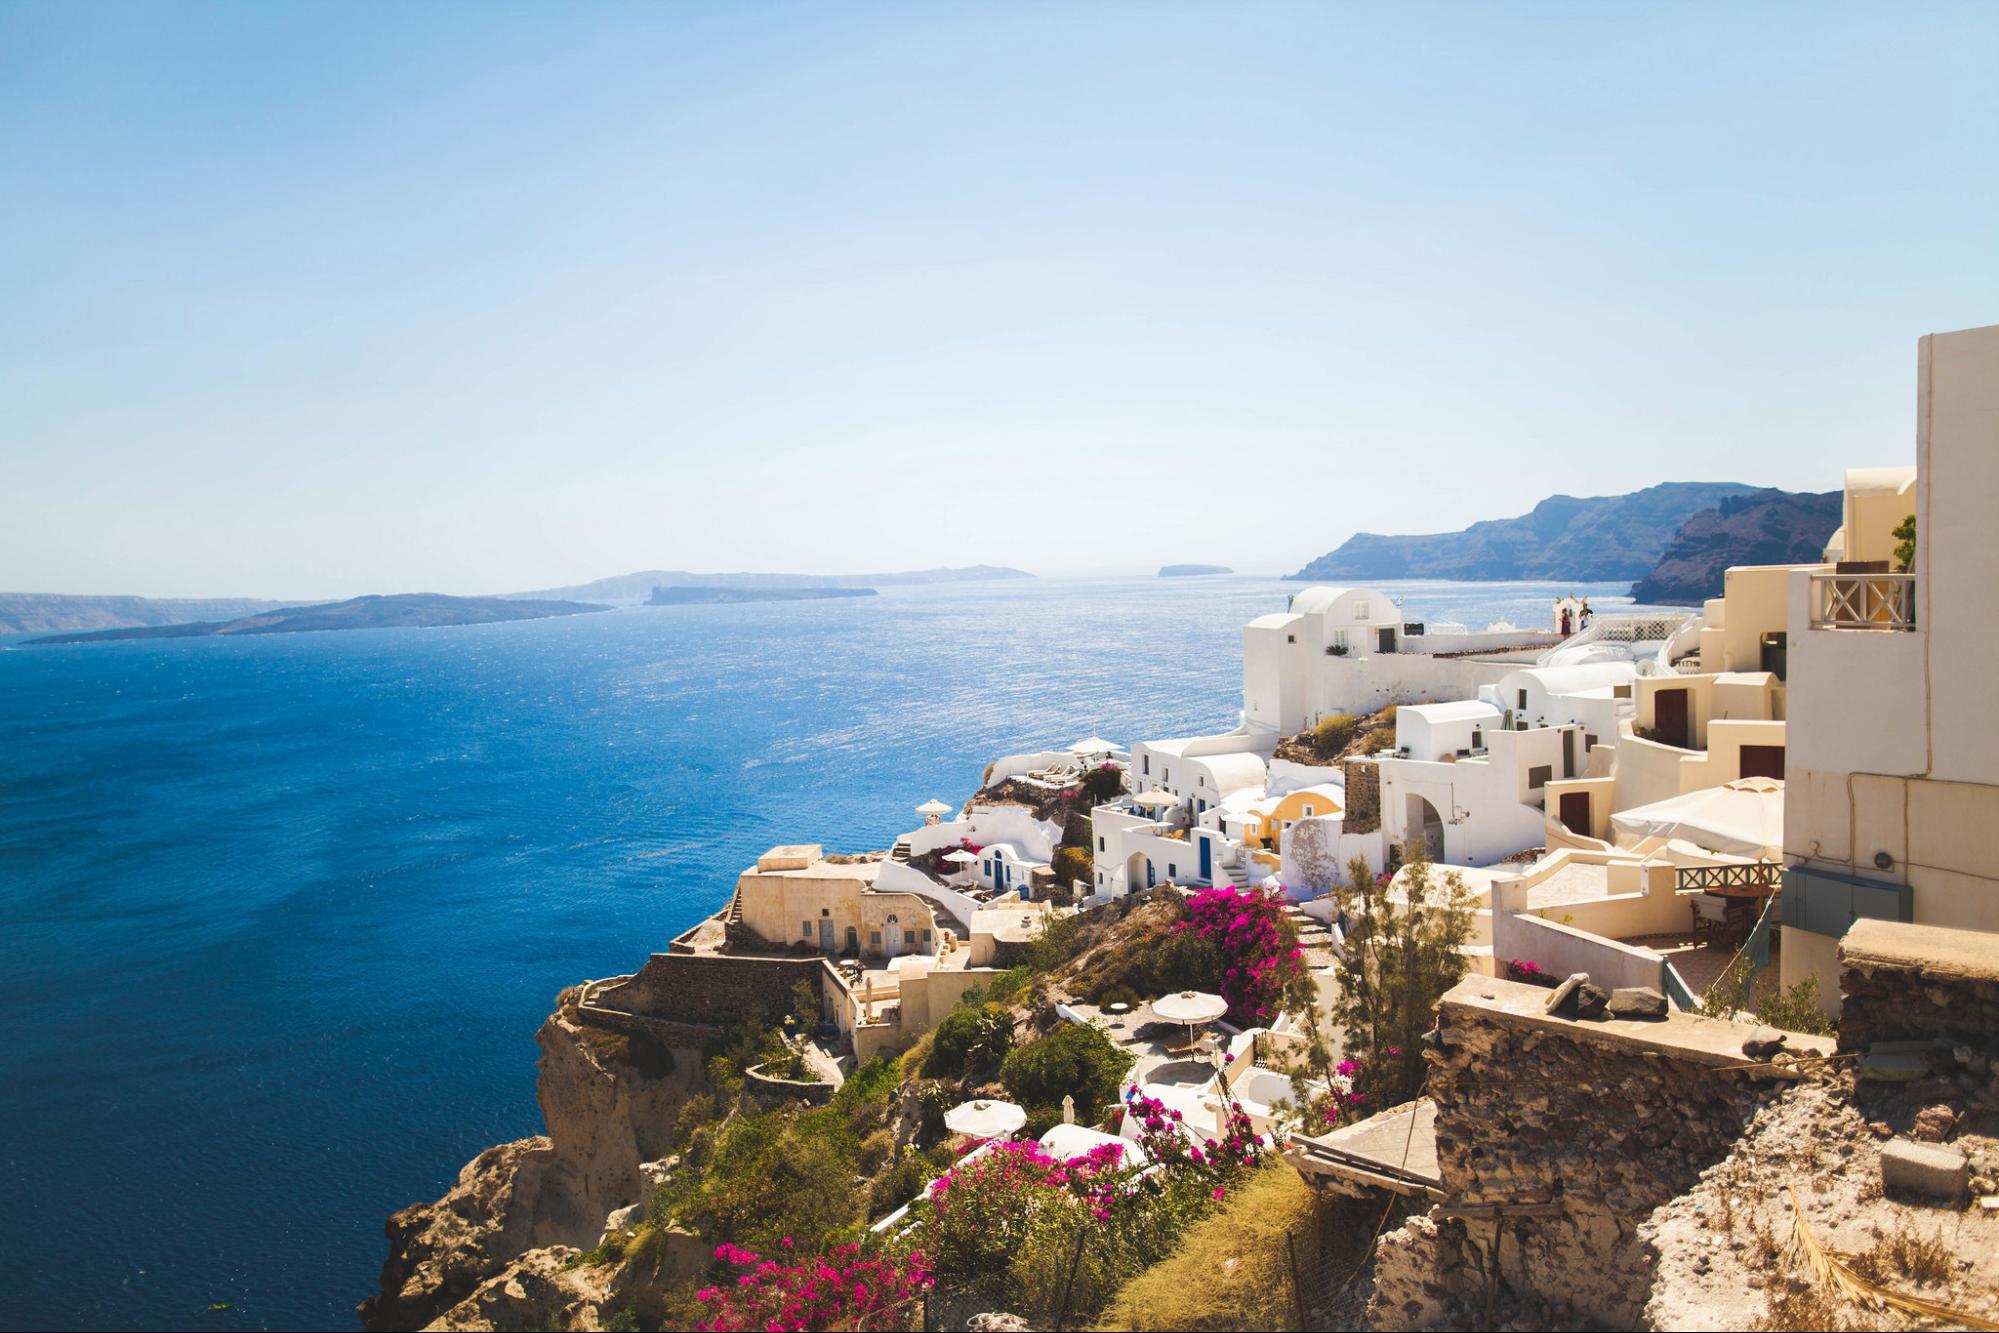 Cruise along the Mediterranean coast